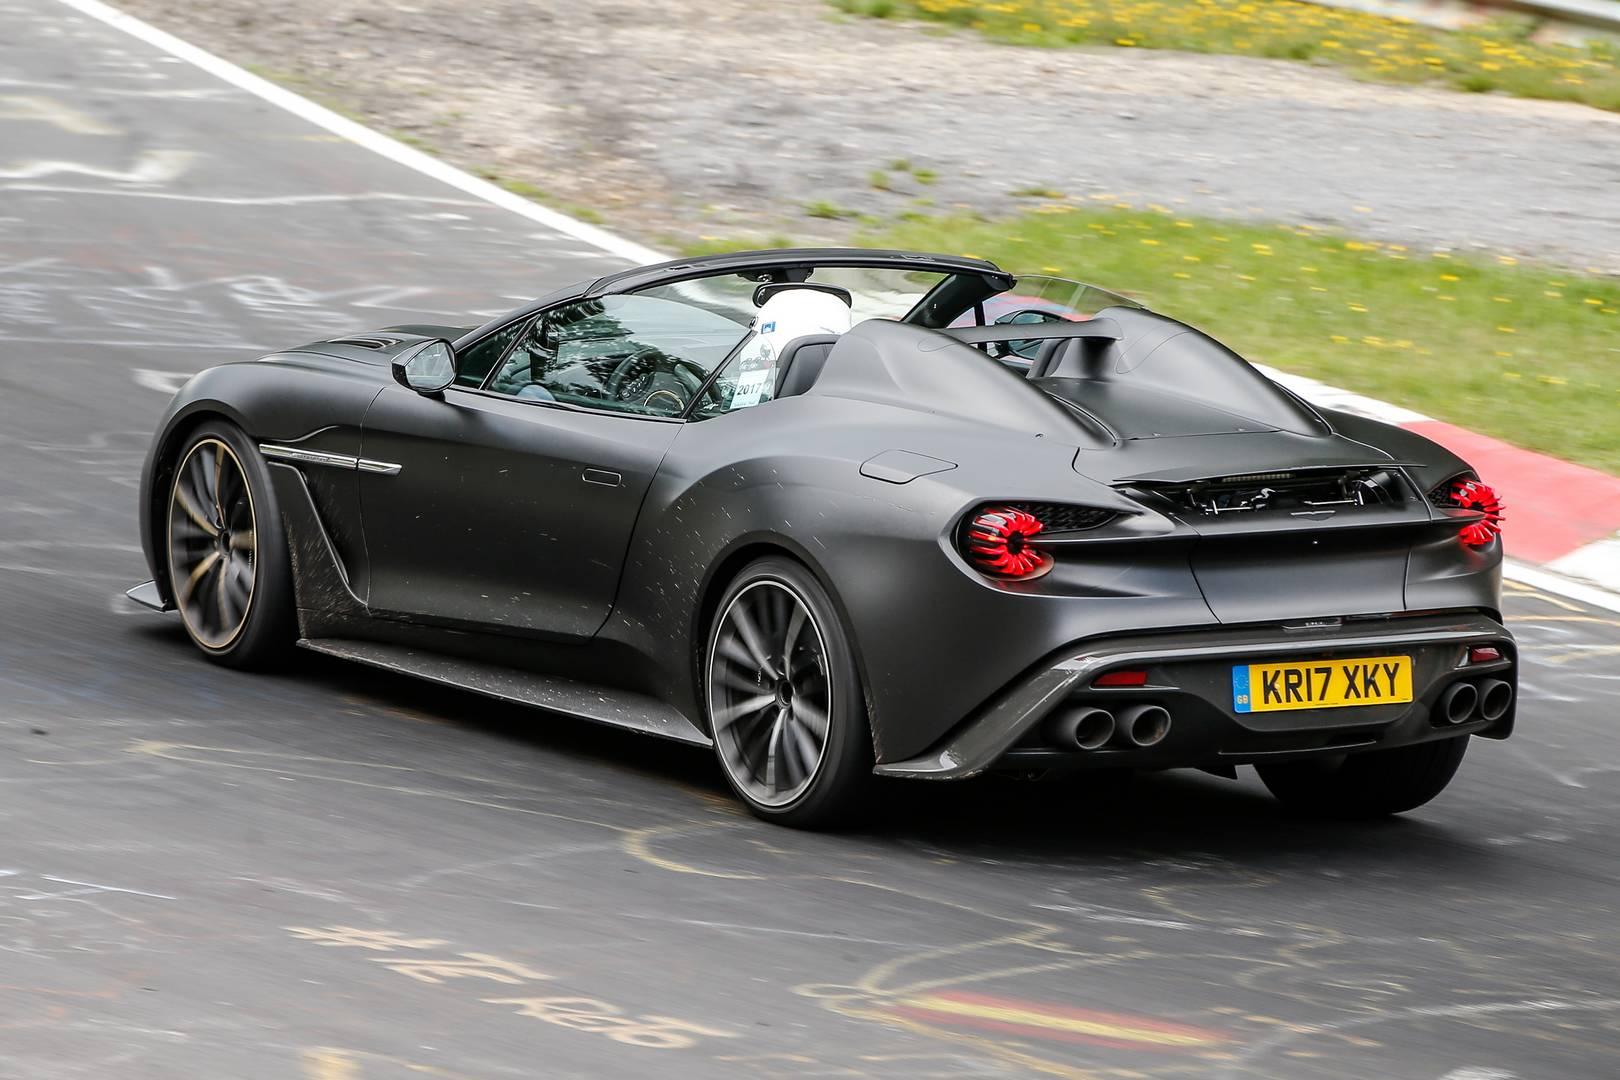 Aston Martin Vanquish Zagato Speedster Price